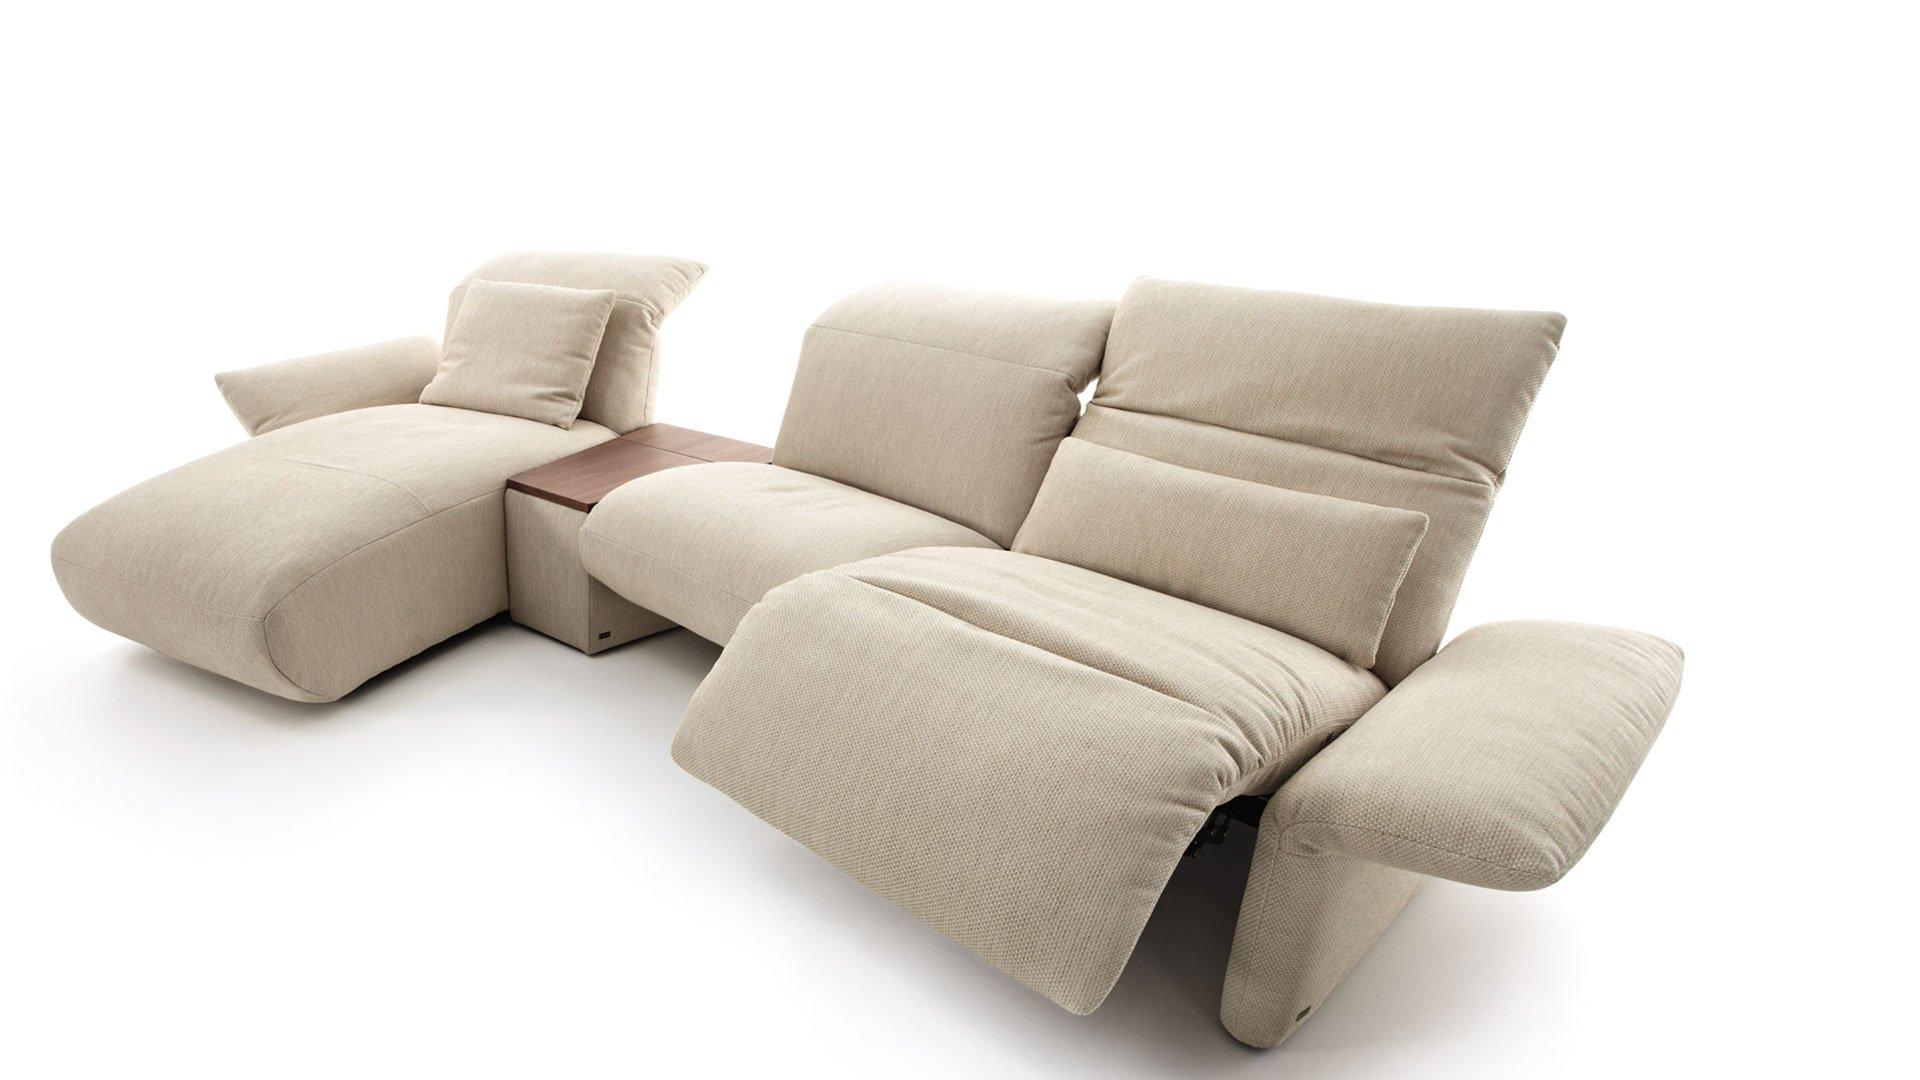 elena home style. Black Bedroom Furniture Sets. Home Design Ideas